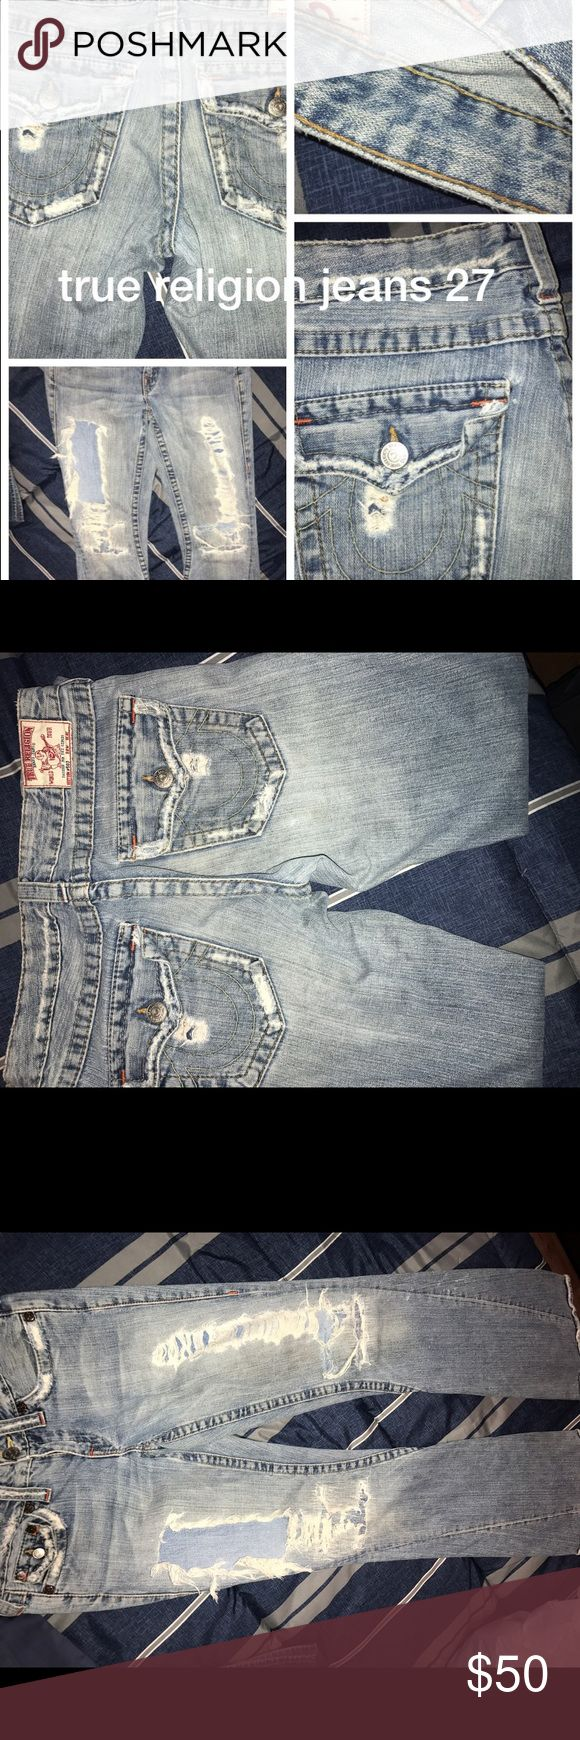 True religion Jeans Denim distress raw true religion vintage jeans size 27 True Religion Jeans Skinny